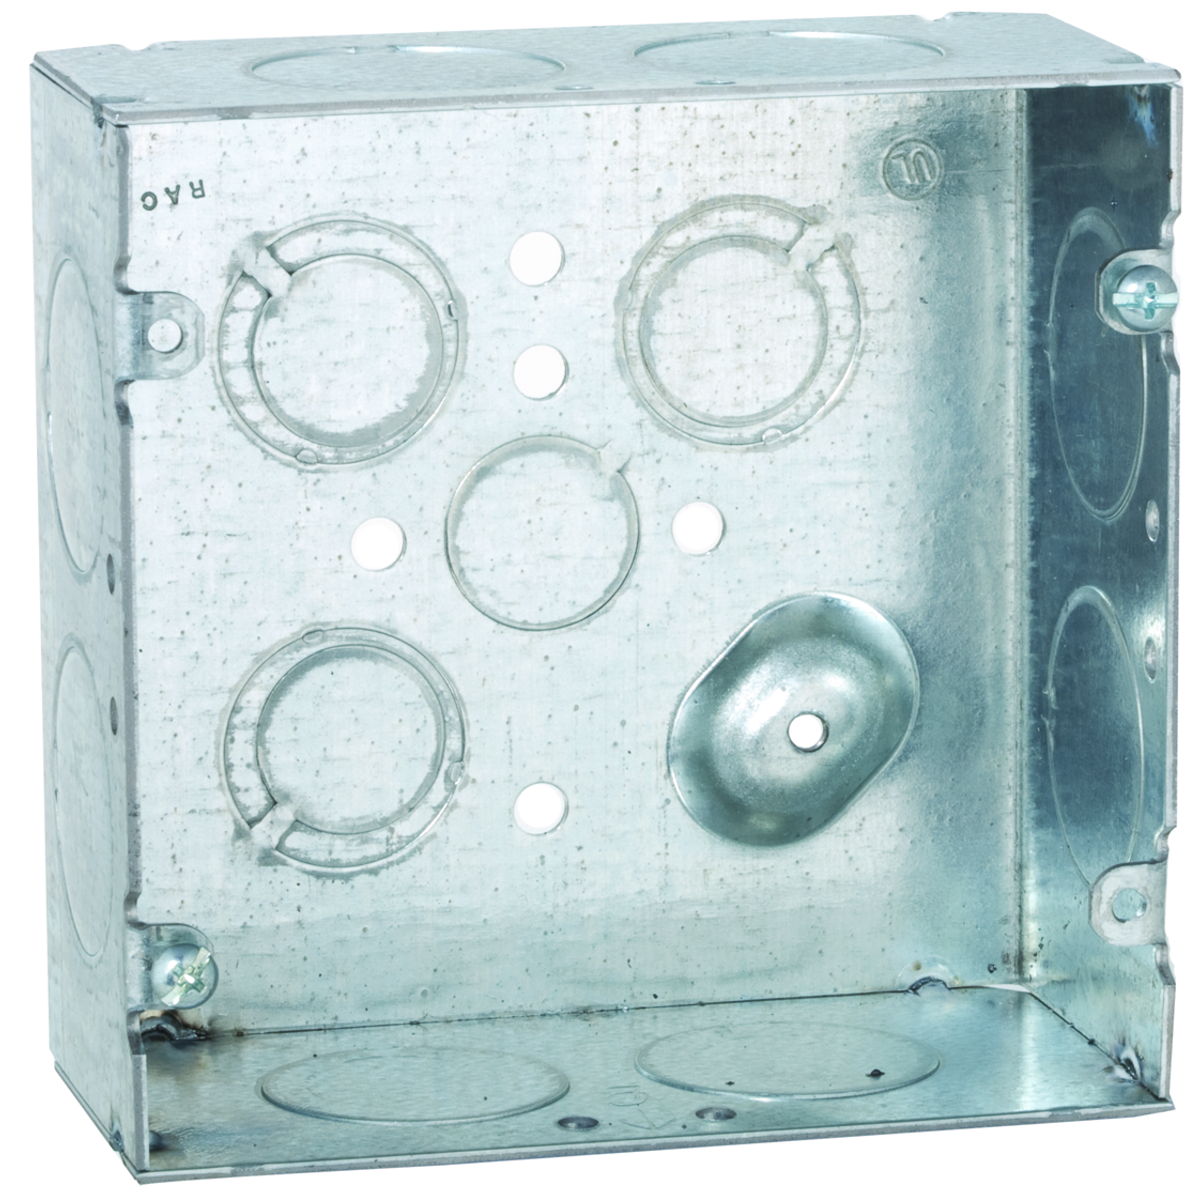 RAC 258 SQUARE BOX 4-11/16 -1 KO